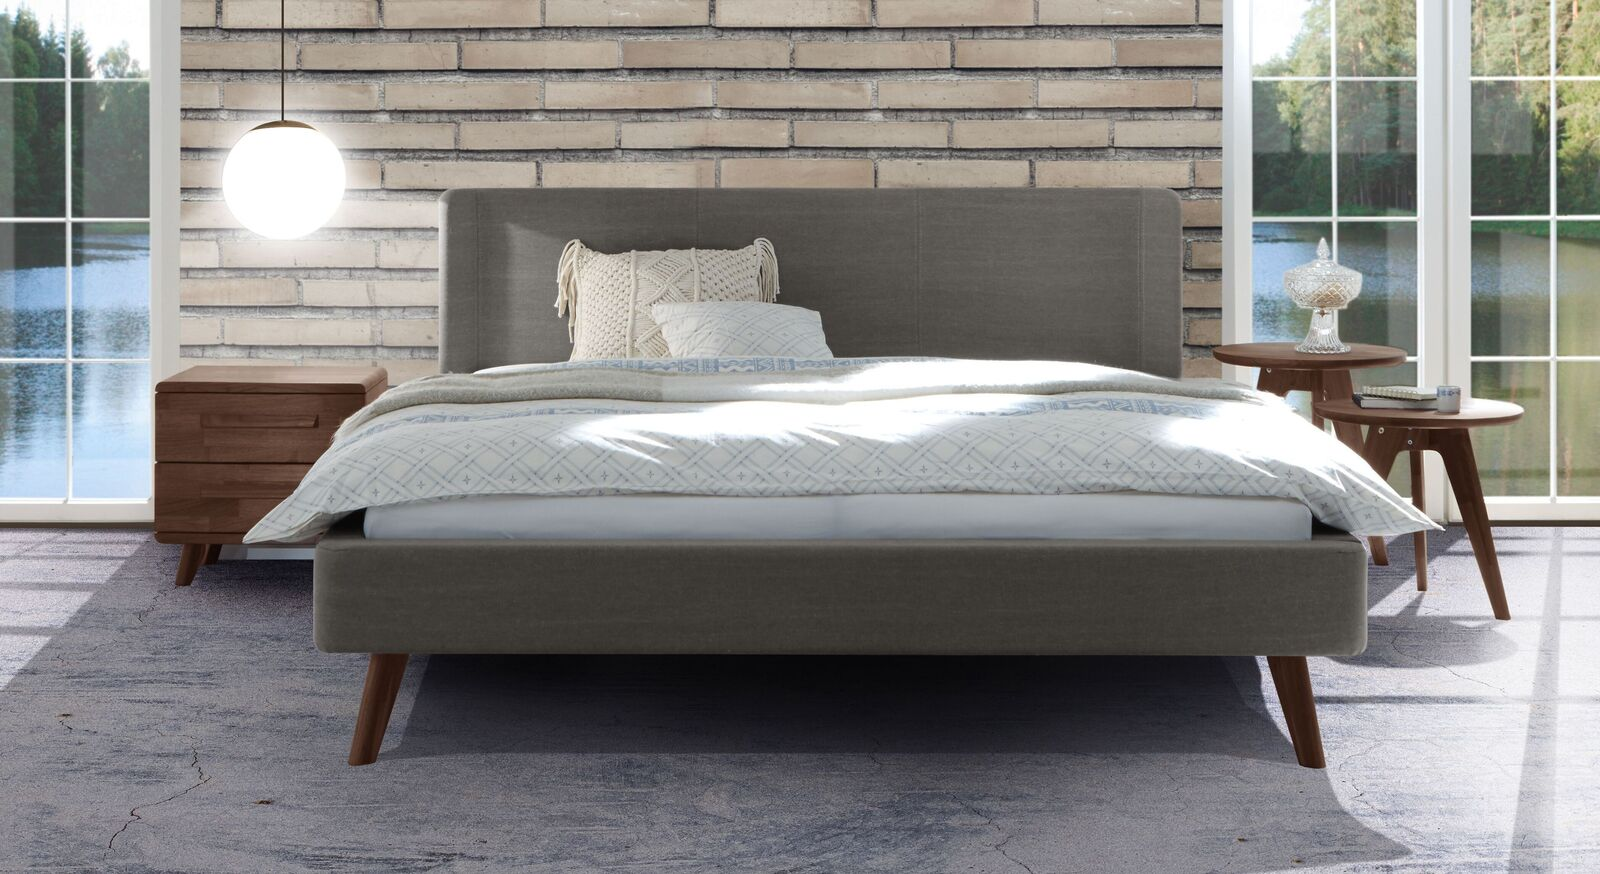 Modernes Bett Lovisa mit grauem Stoffbezug